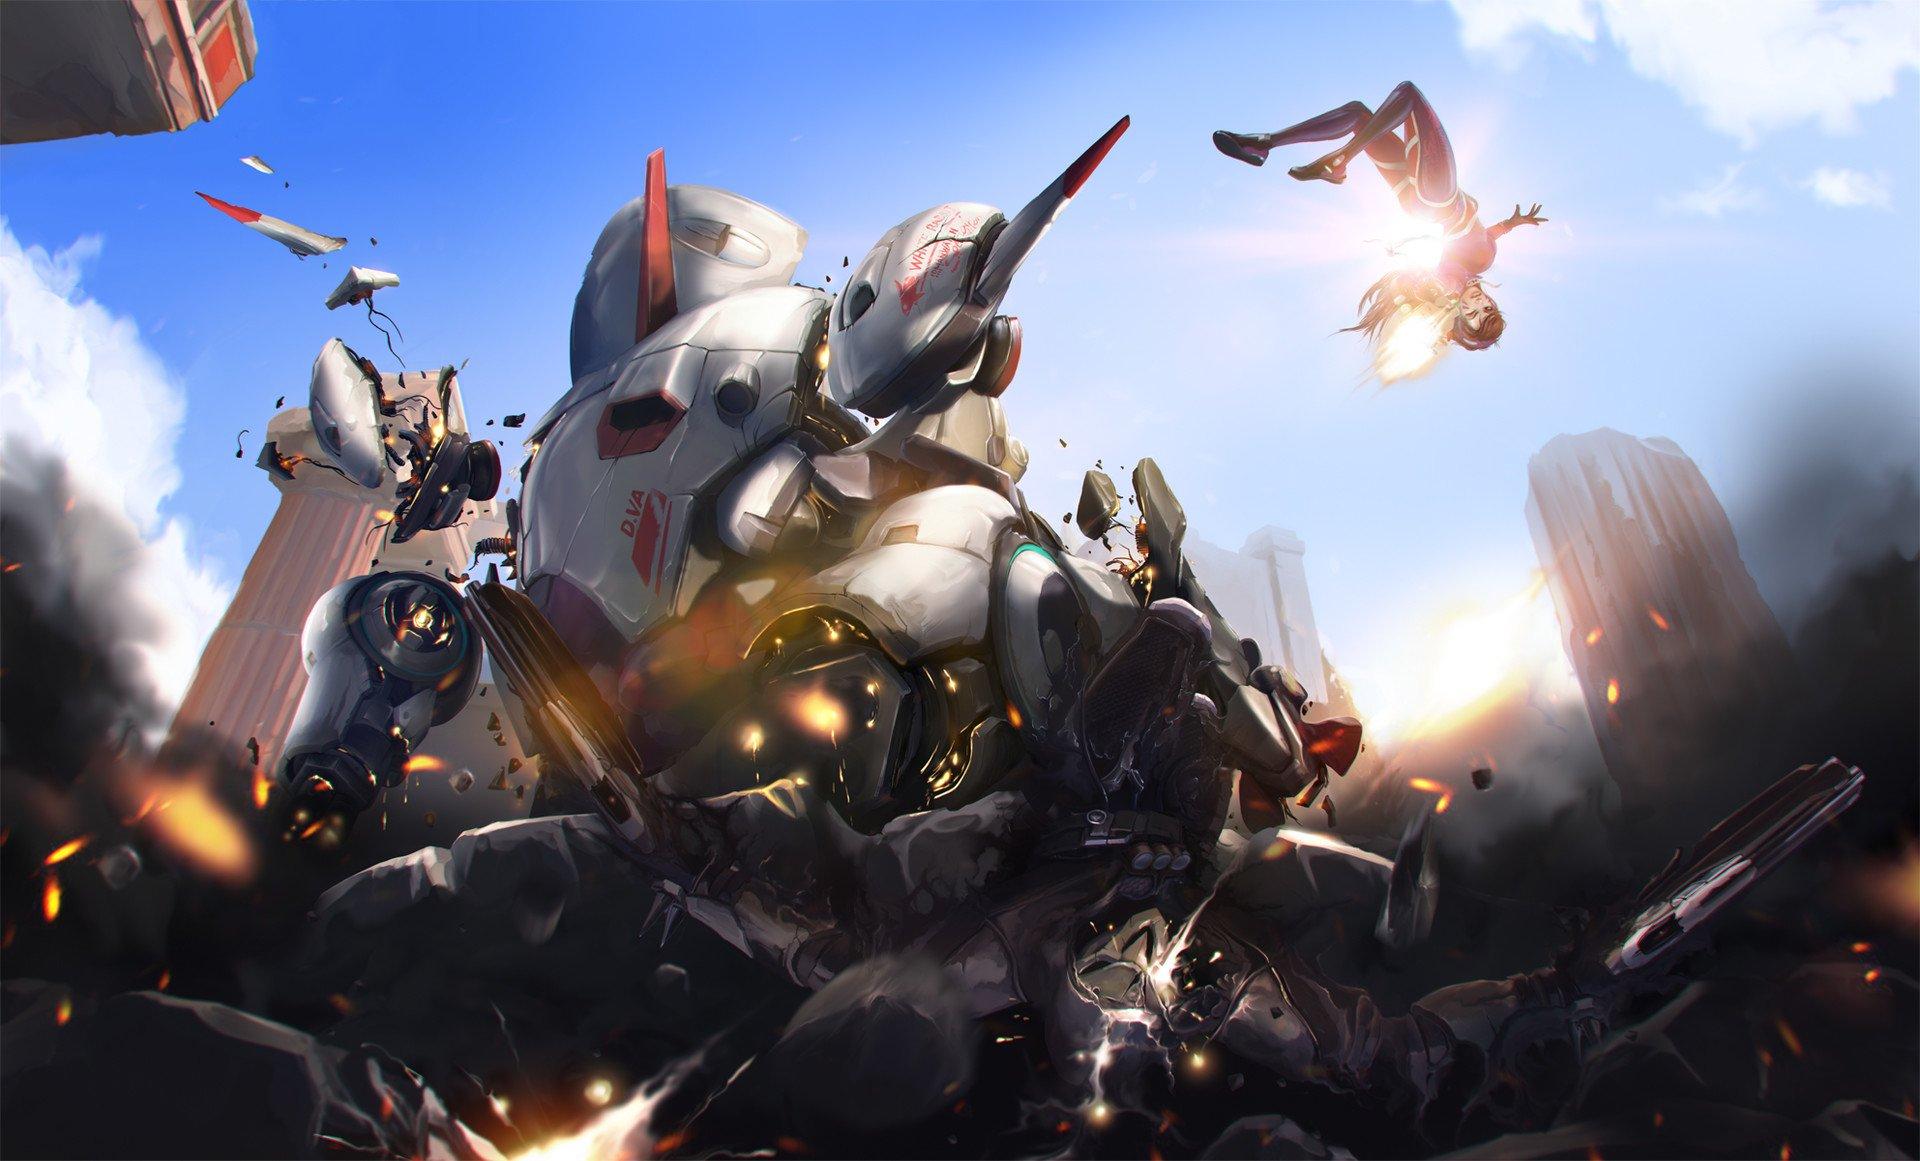 130 Reaper (Overwatch) HD Wallpapers   Hintergrunde - Wallpaper Abyss